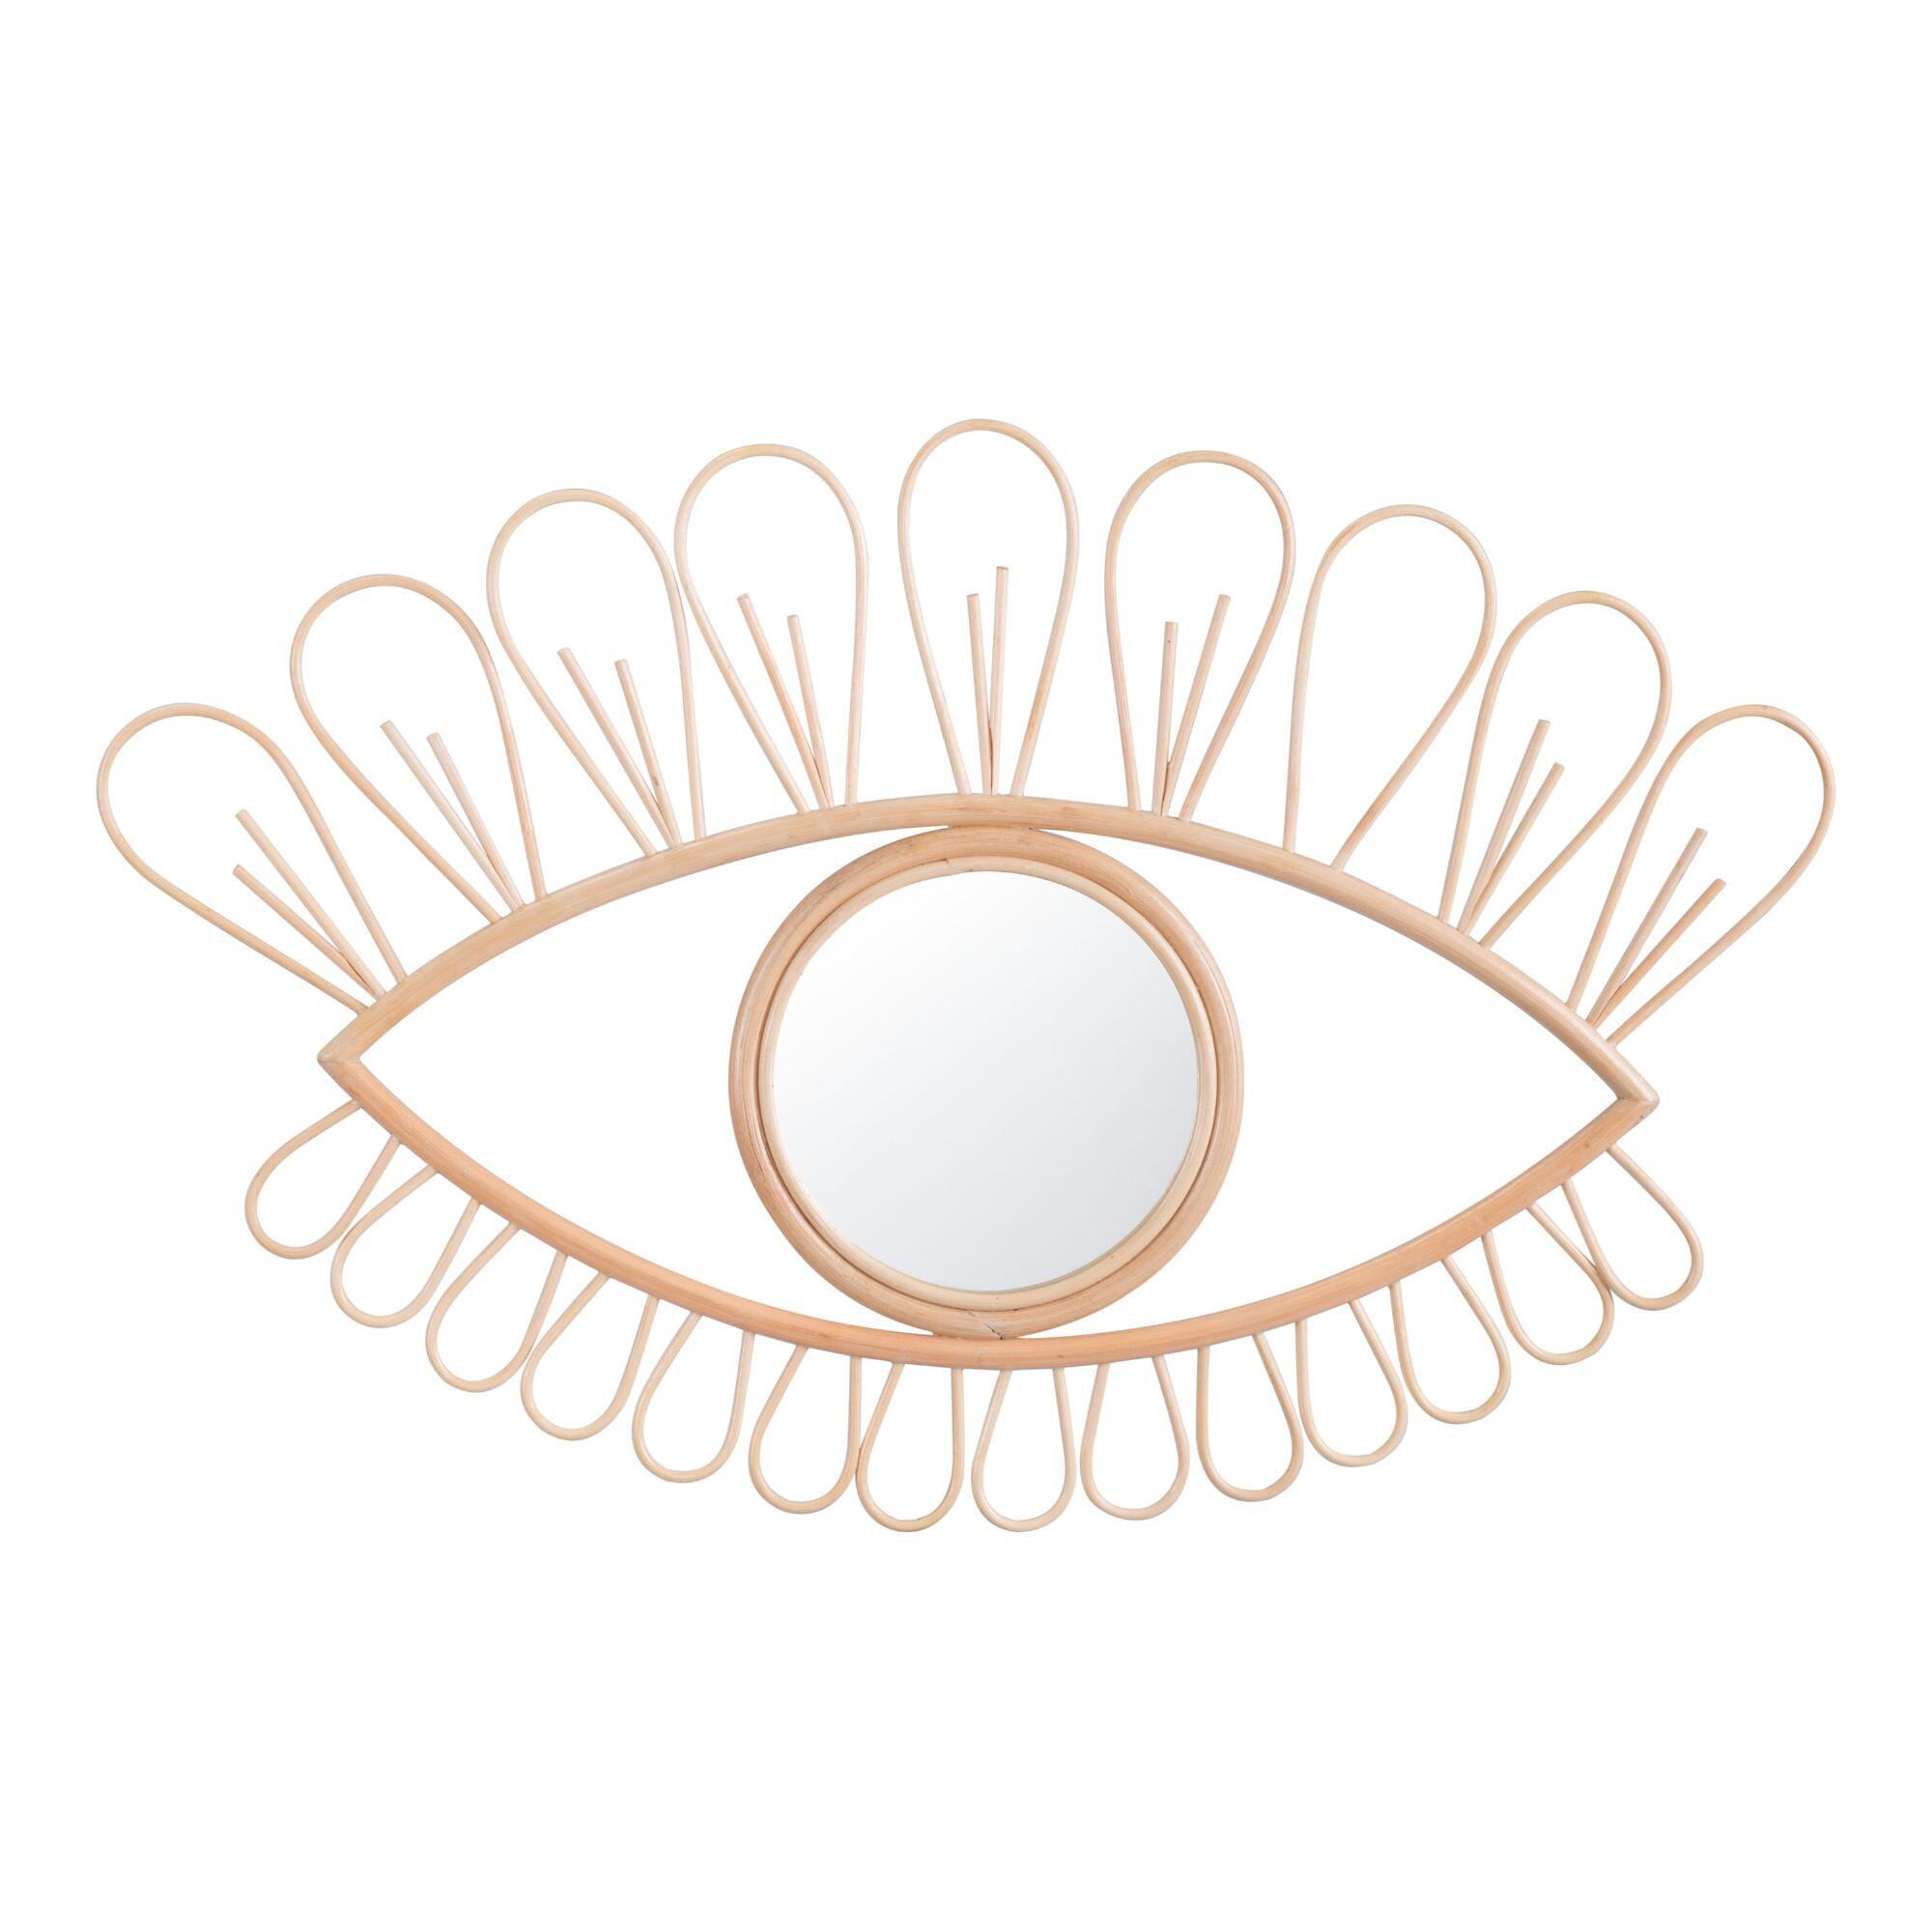 natural rattan eye mirror